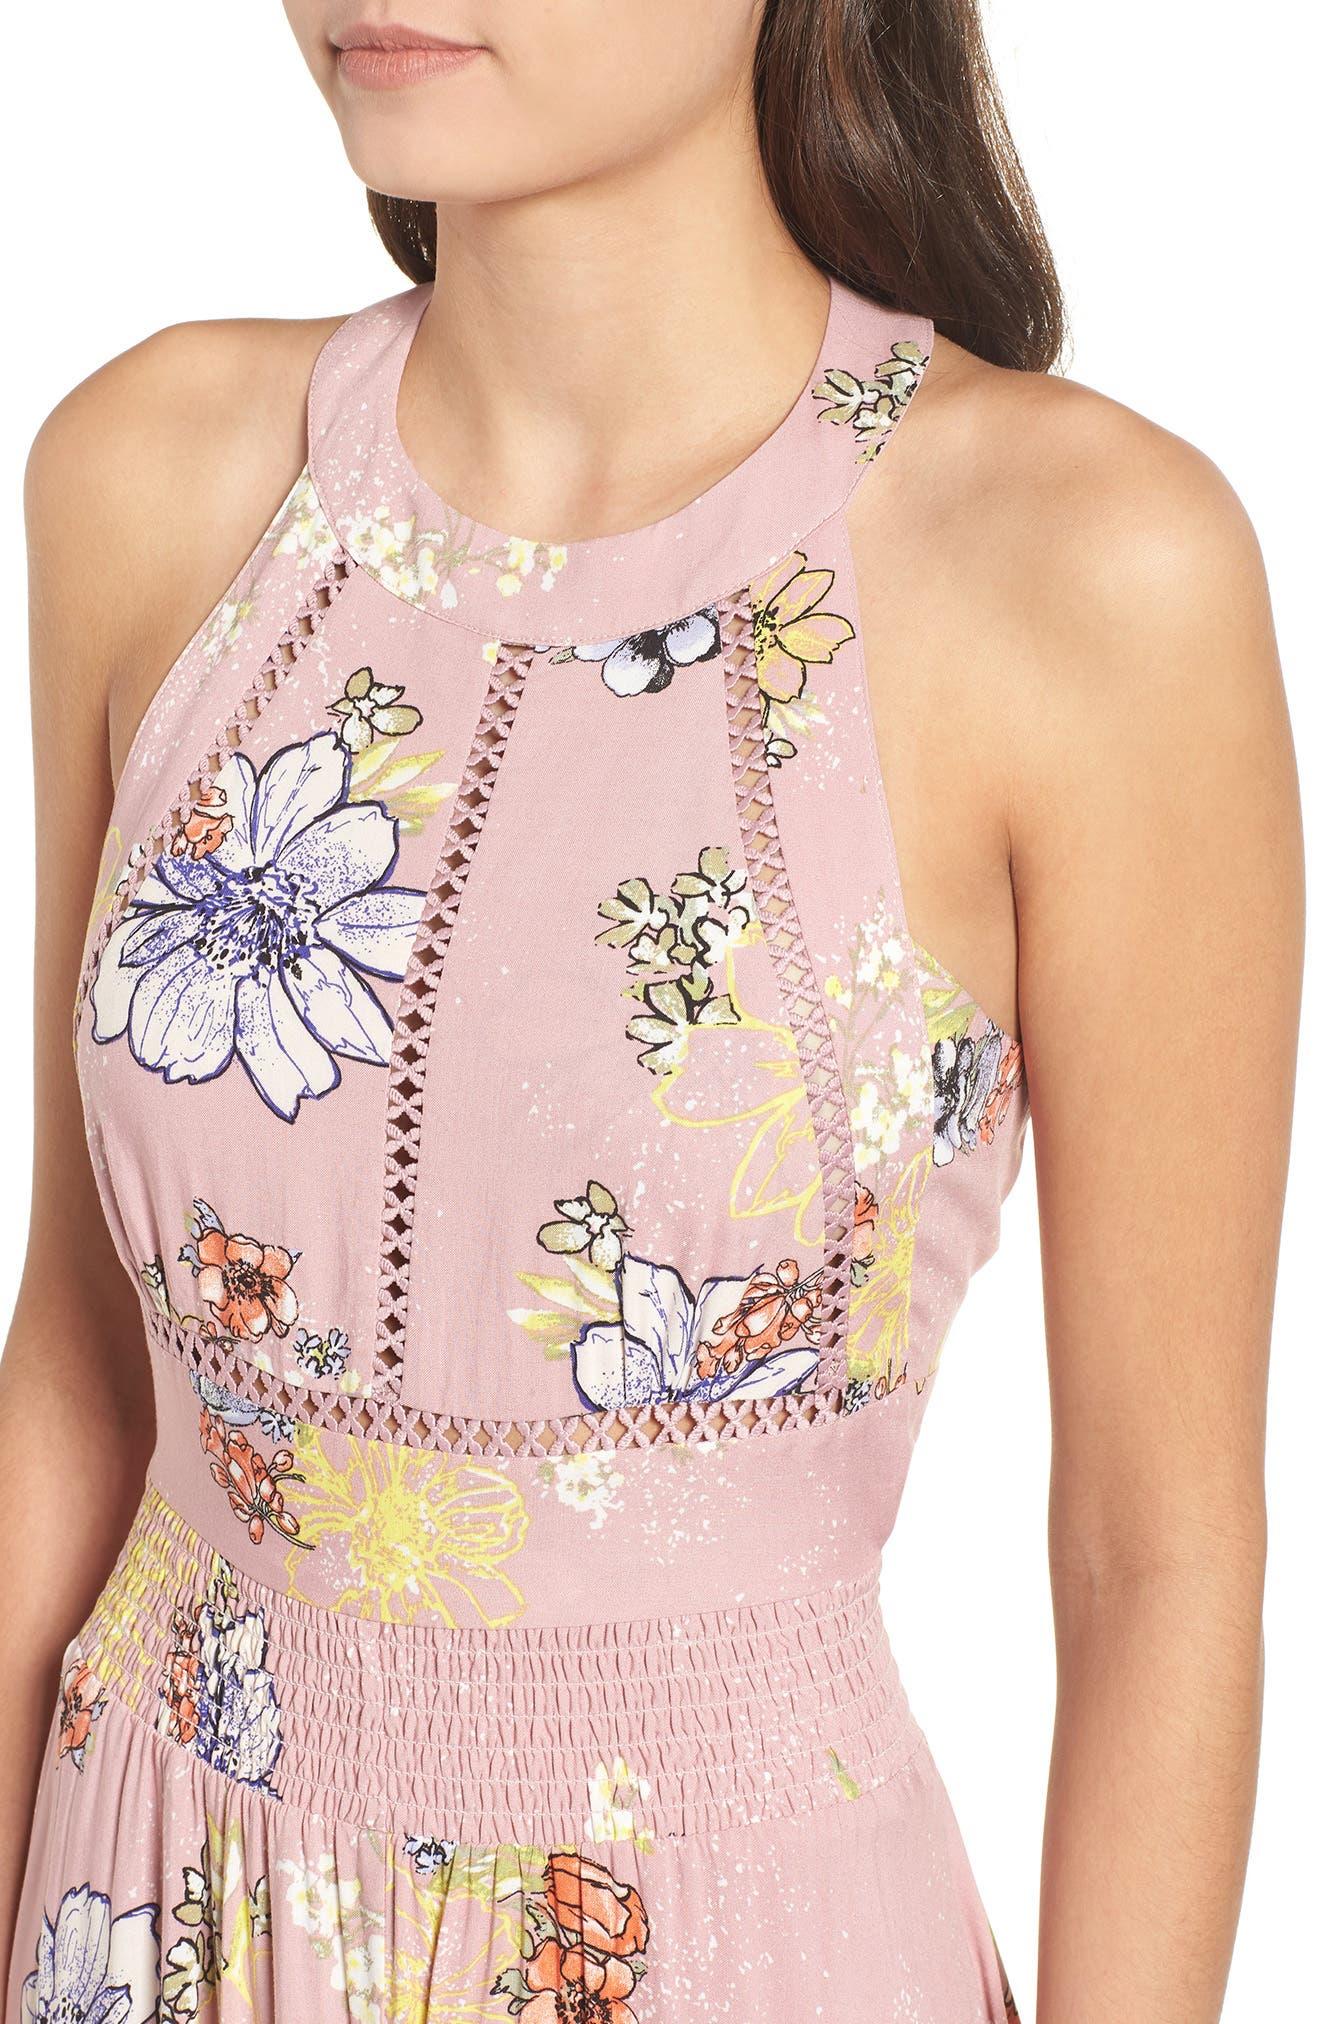 Floral Print Halter Maxi Dress,                             Alternate thumbnail 4, color,                             PINK EGRET ABSTRACT FLORAL